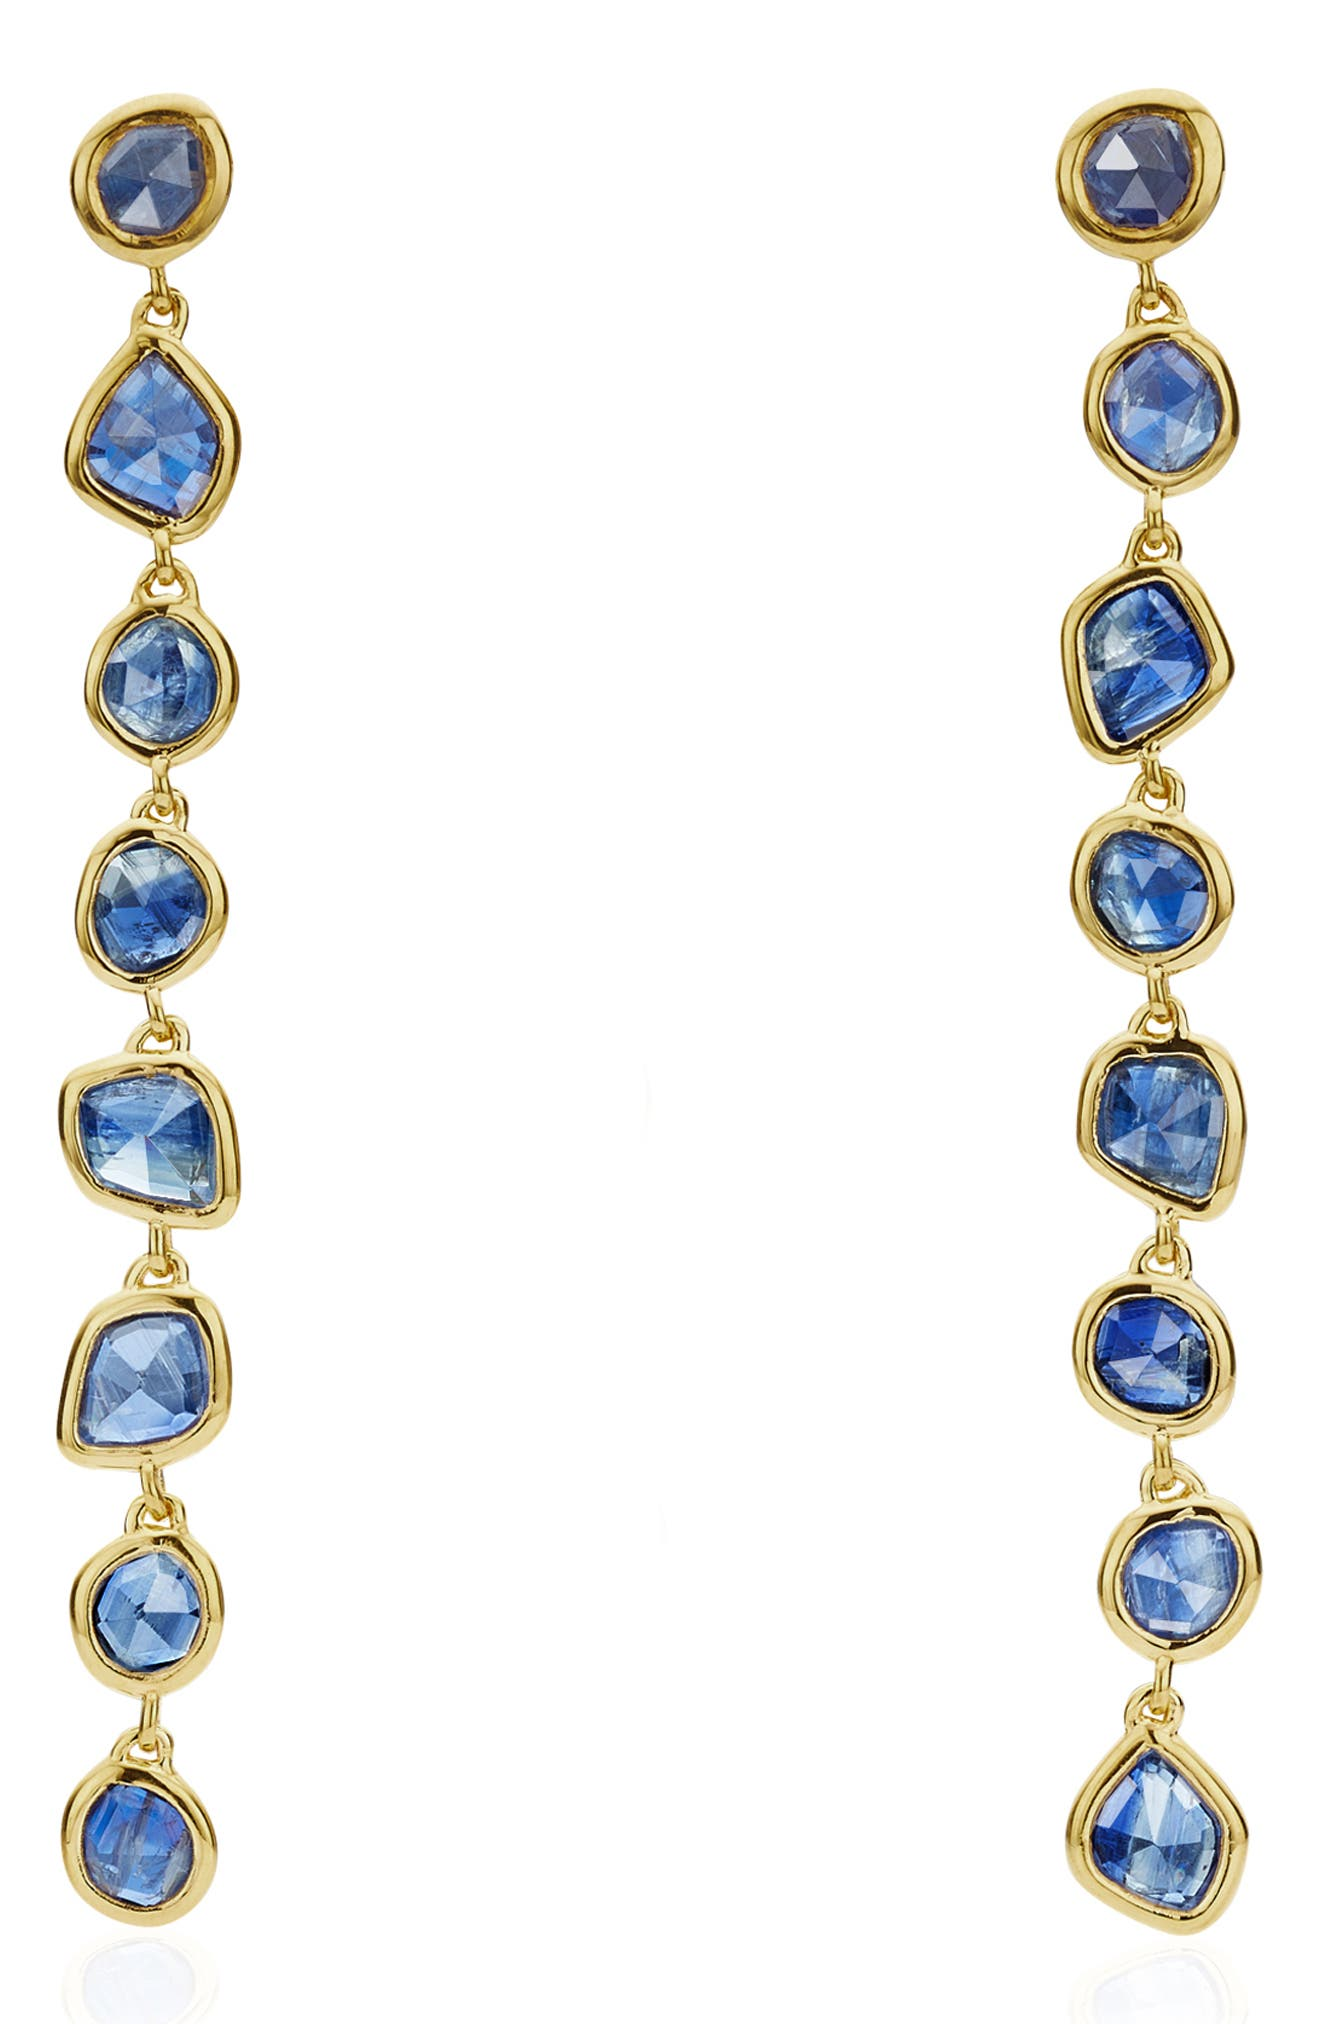 Women's Monica Vinader Siren Mini Nugget Earrings